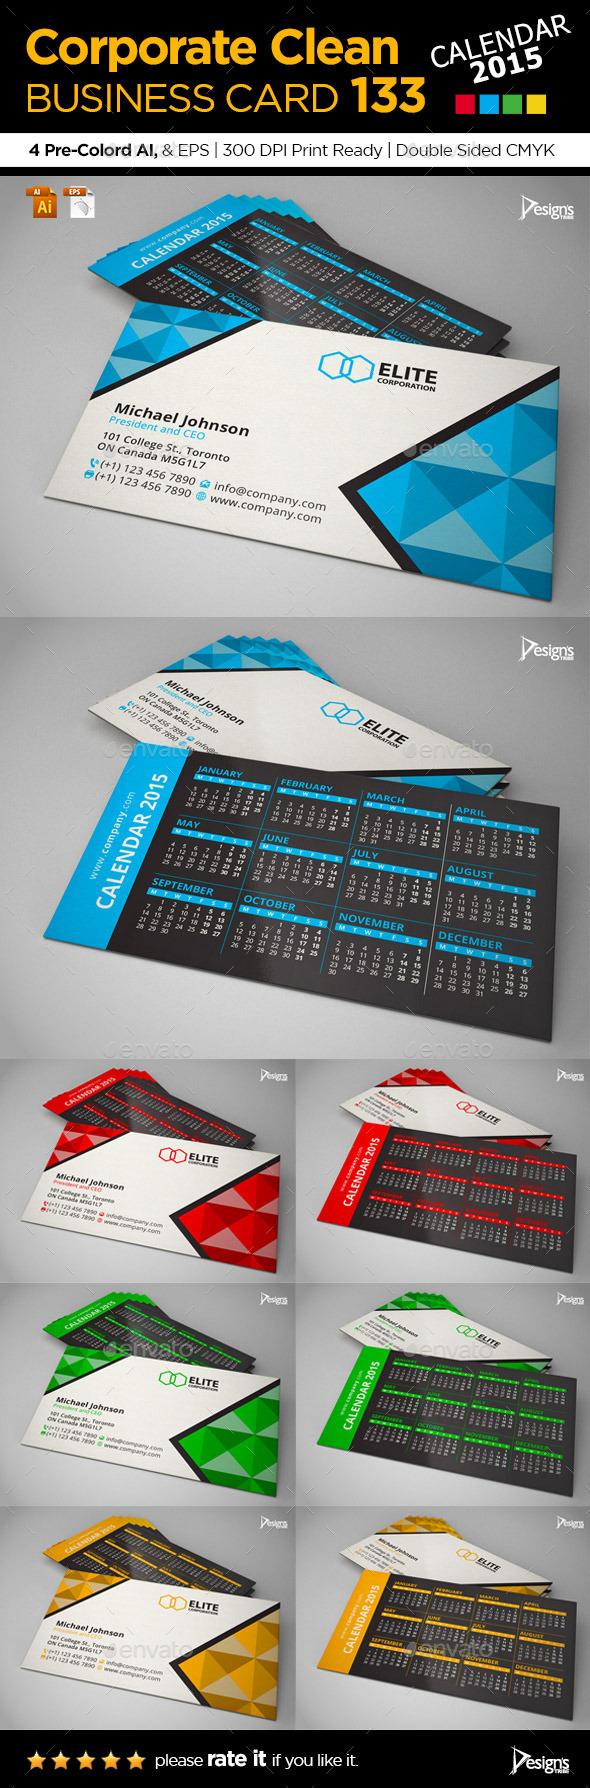 Calendar 2015 Business Card - Business Cards Print Templates